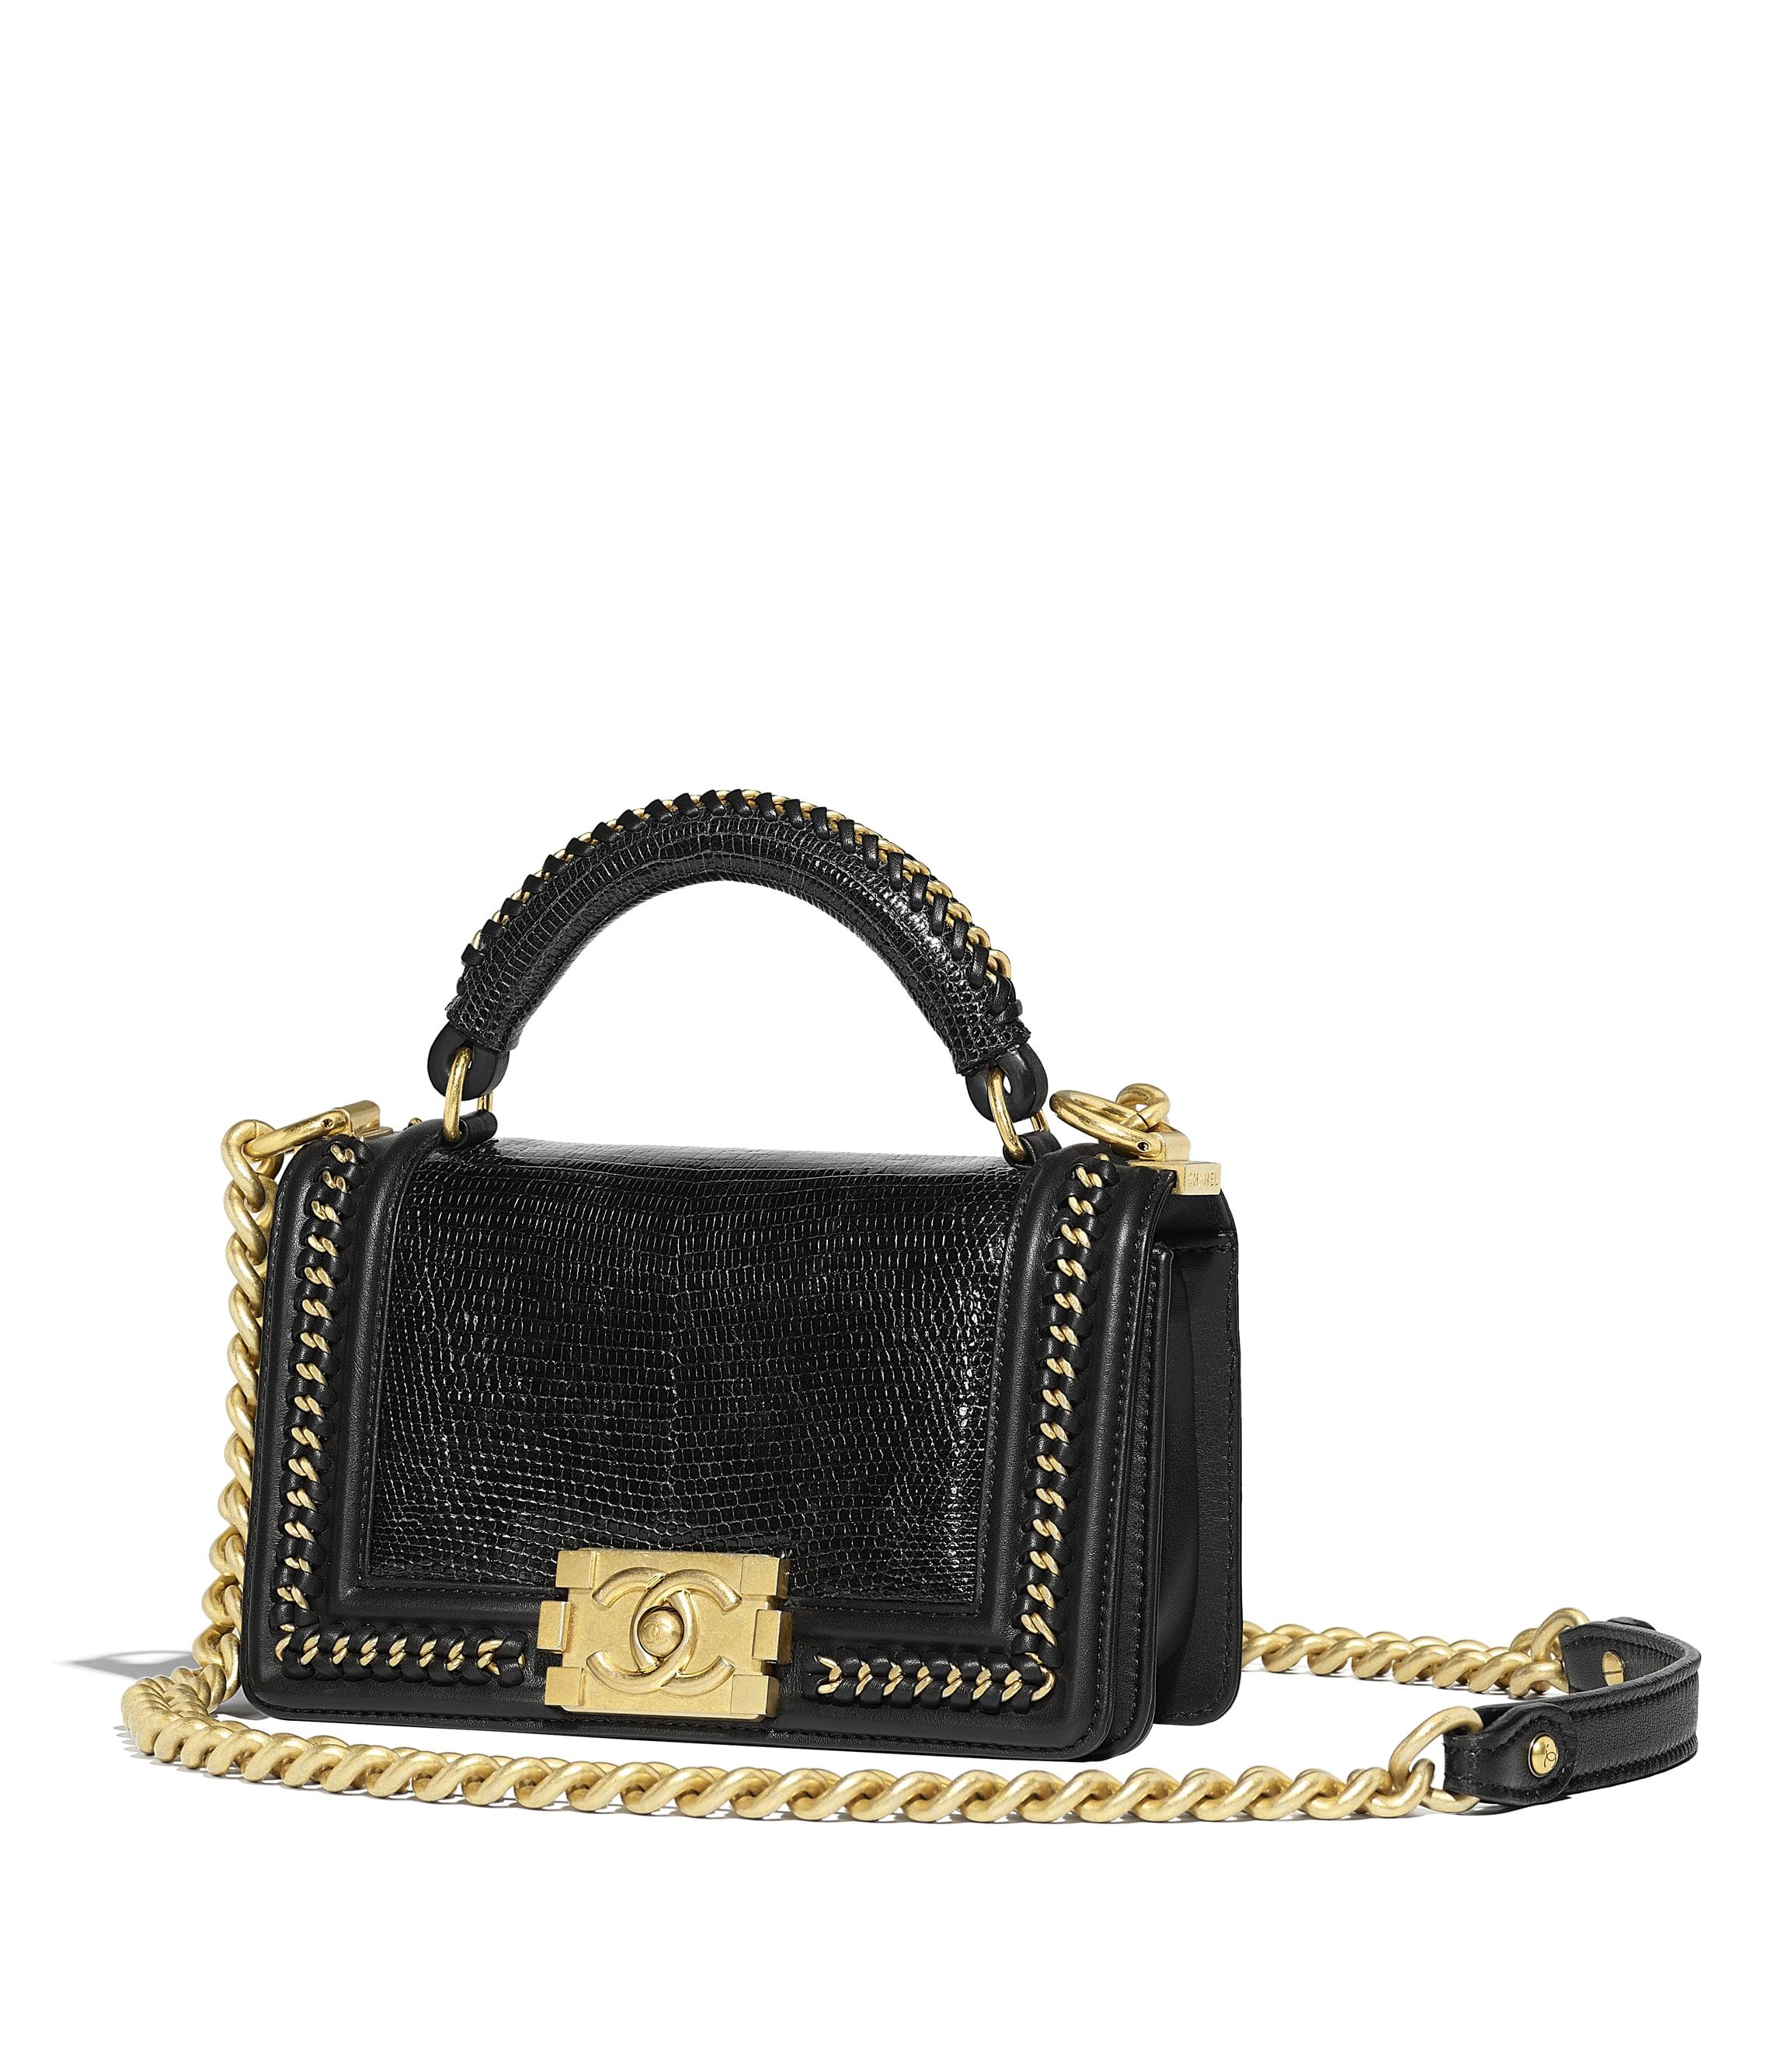 Boy Chanel Handbag With Handle